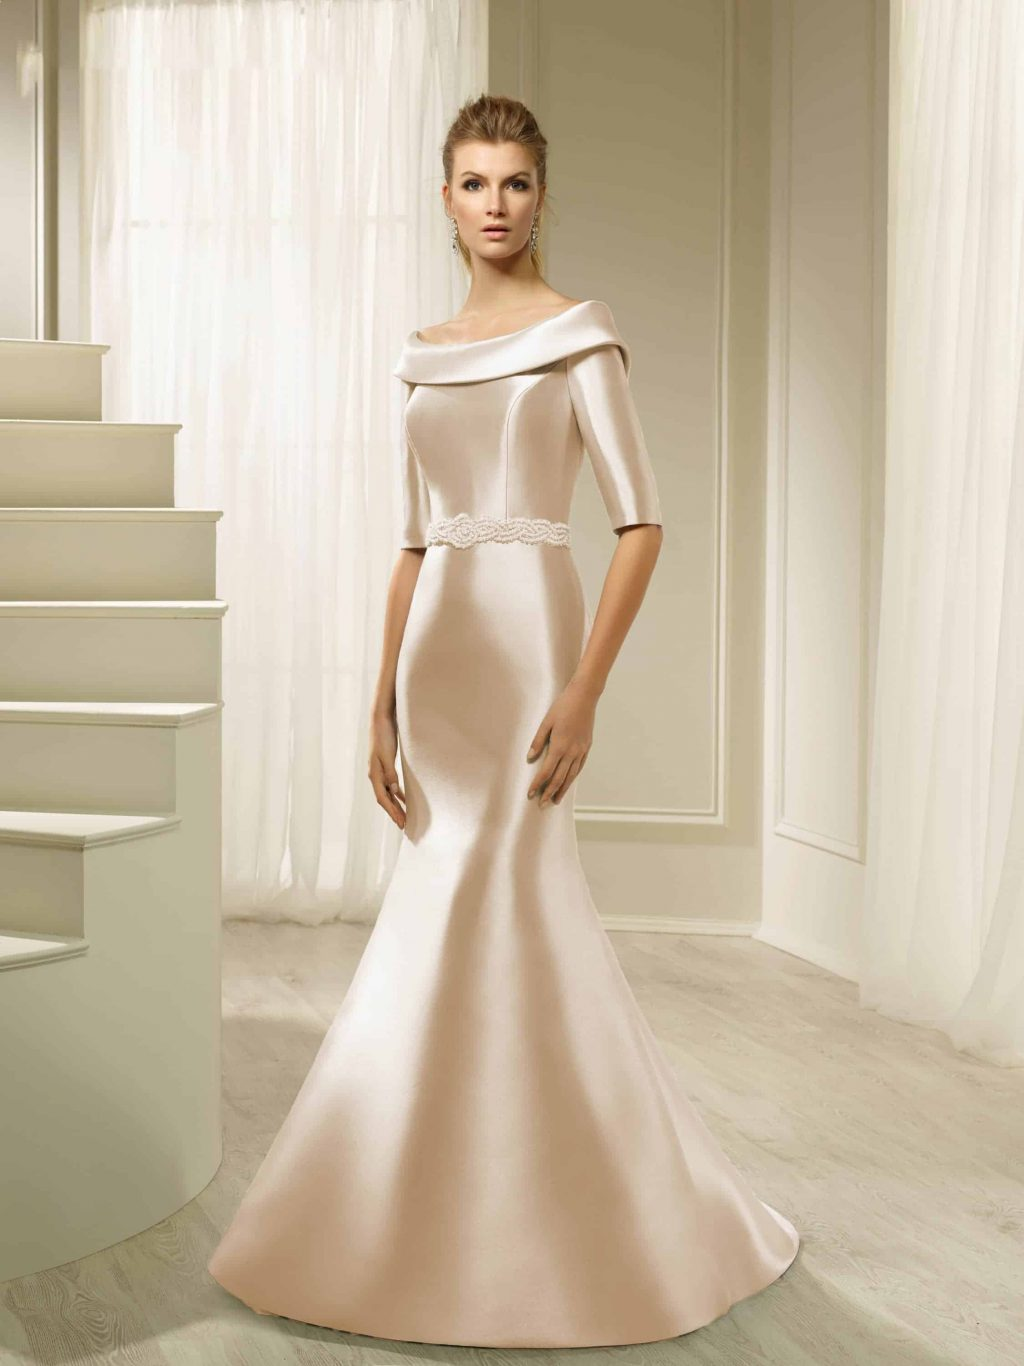 Long fitted dress elegant maternity dress classic dress   Etsy